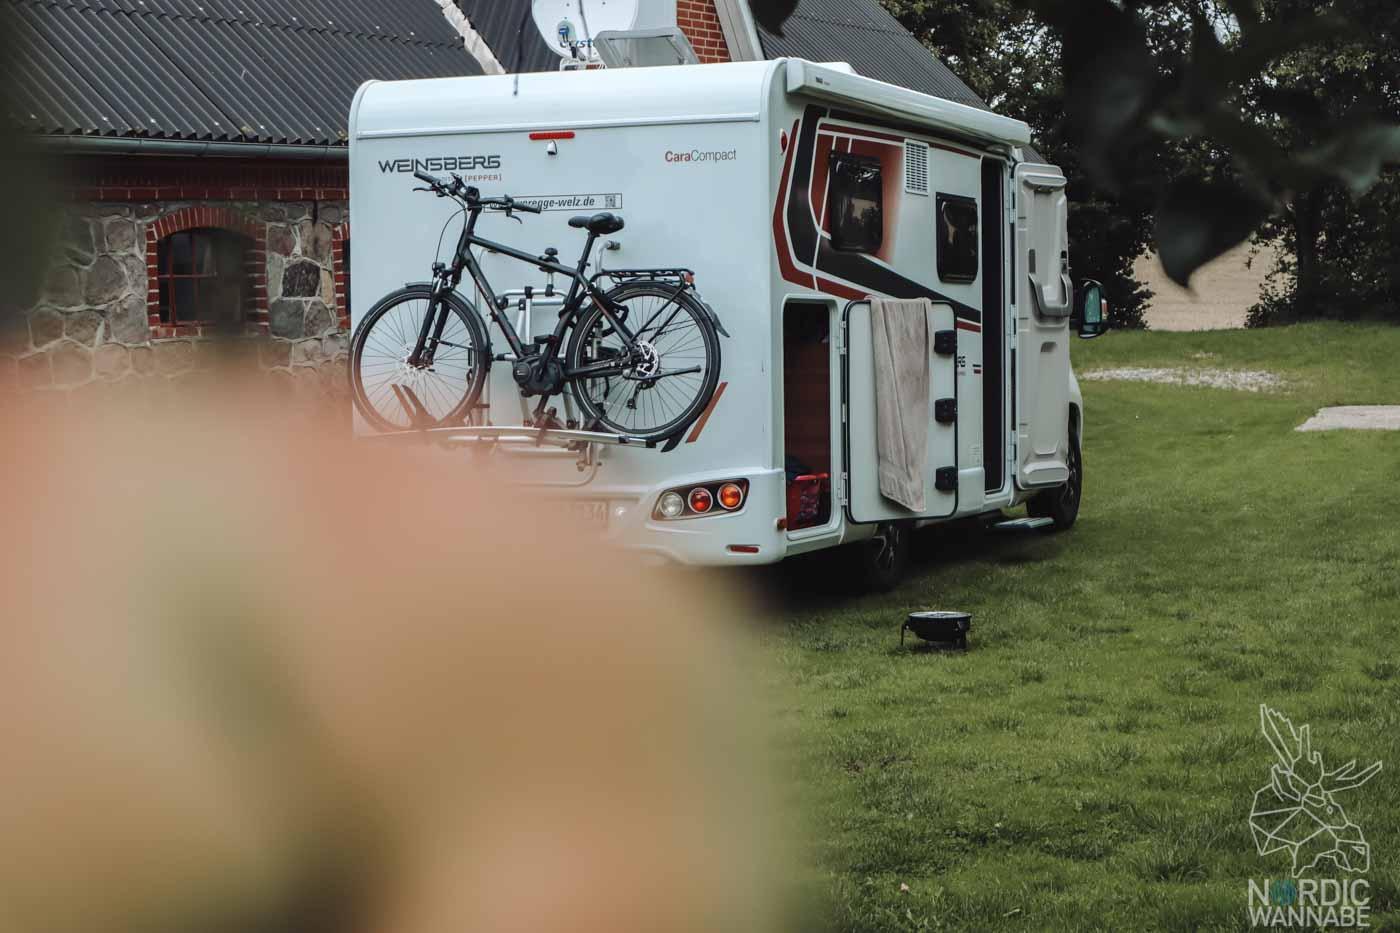 Weinsberg teilintegriertes Wohnmobil mieten, Camping in Dänemark, Camping Dänemark Nordsee, Campingplatz Dänemark, Wohnmobilstellplätze in Dänemark,Camping Dänemark Ostsee, Camping Dänemark Strand